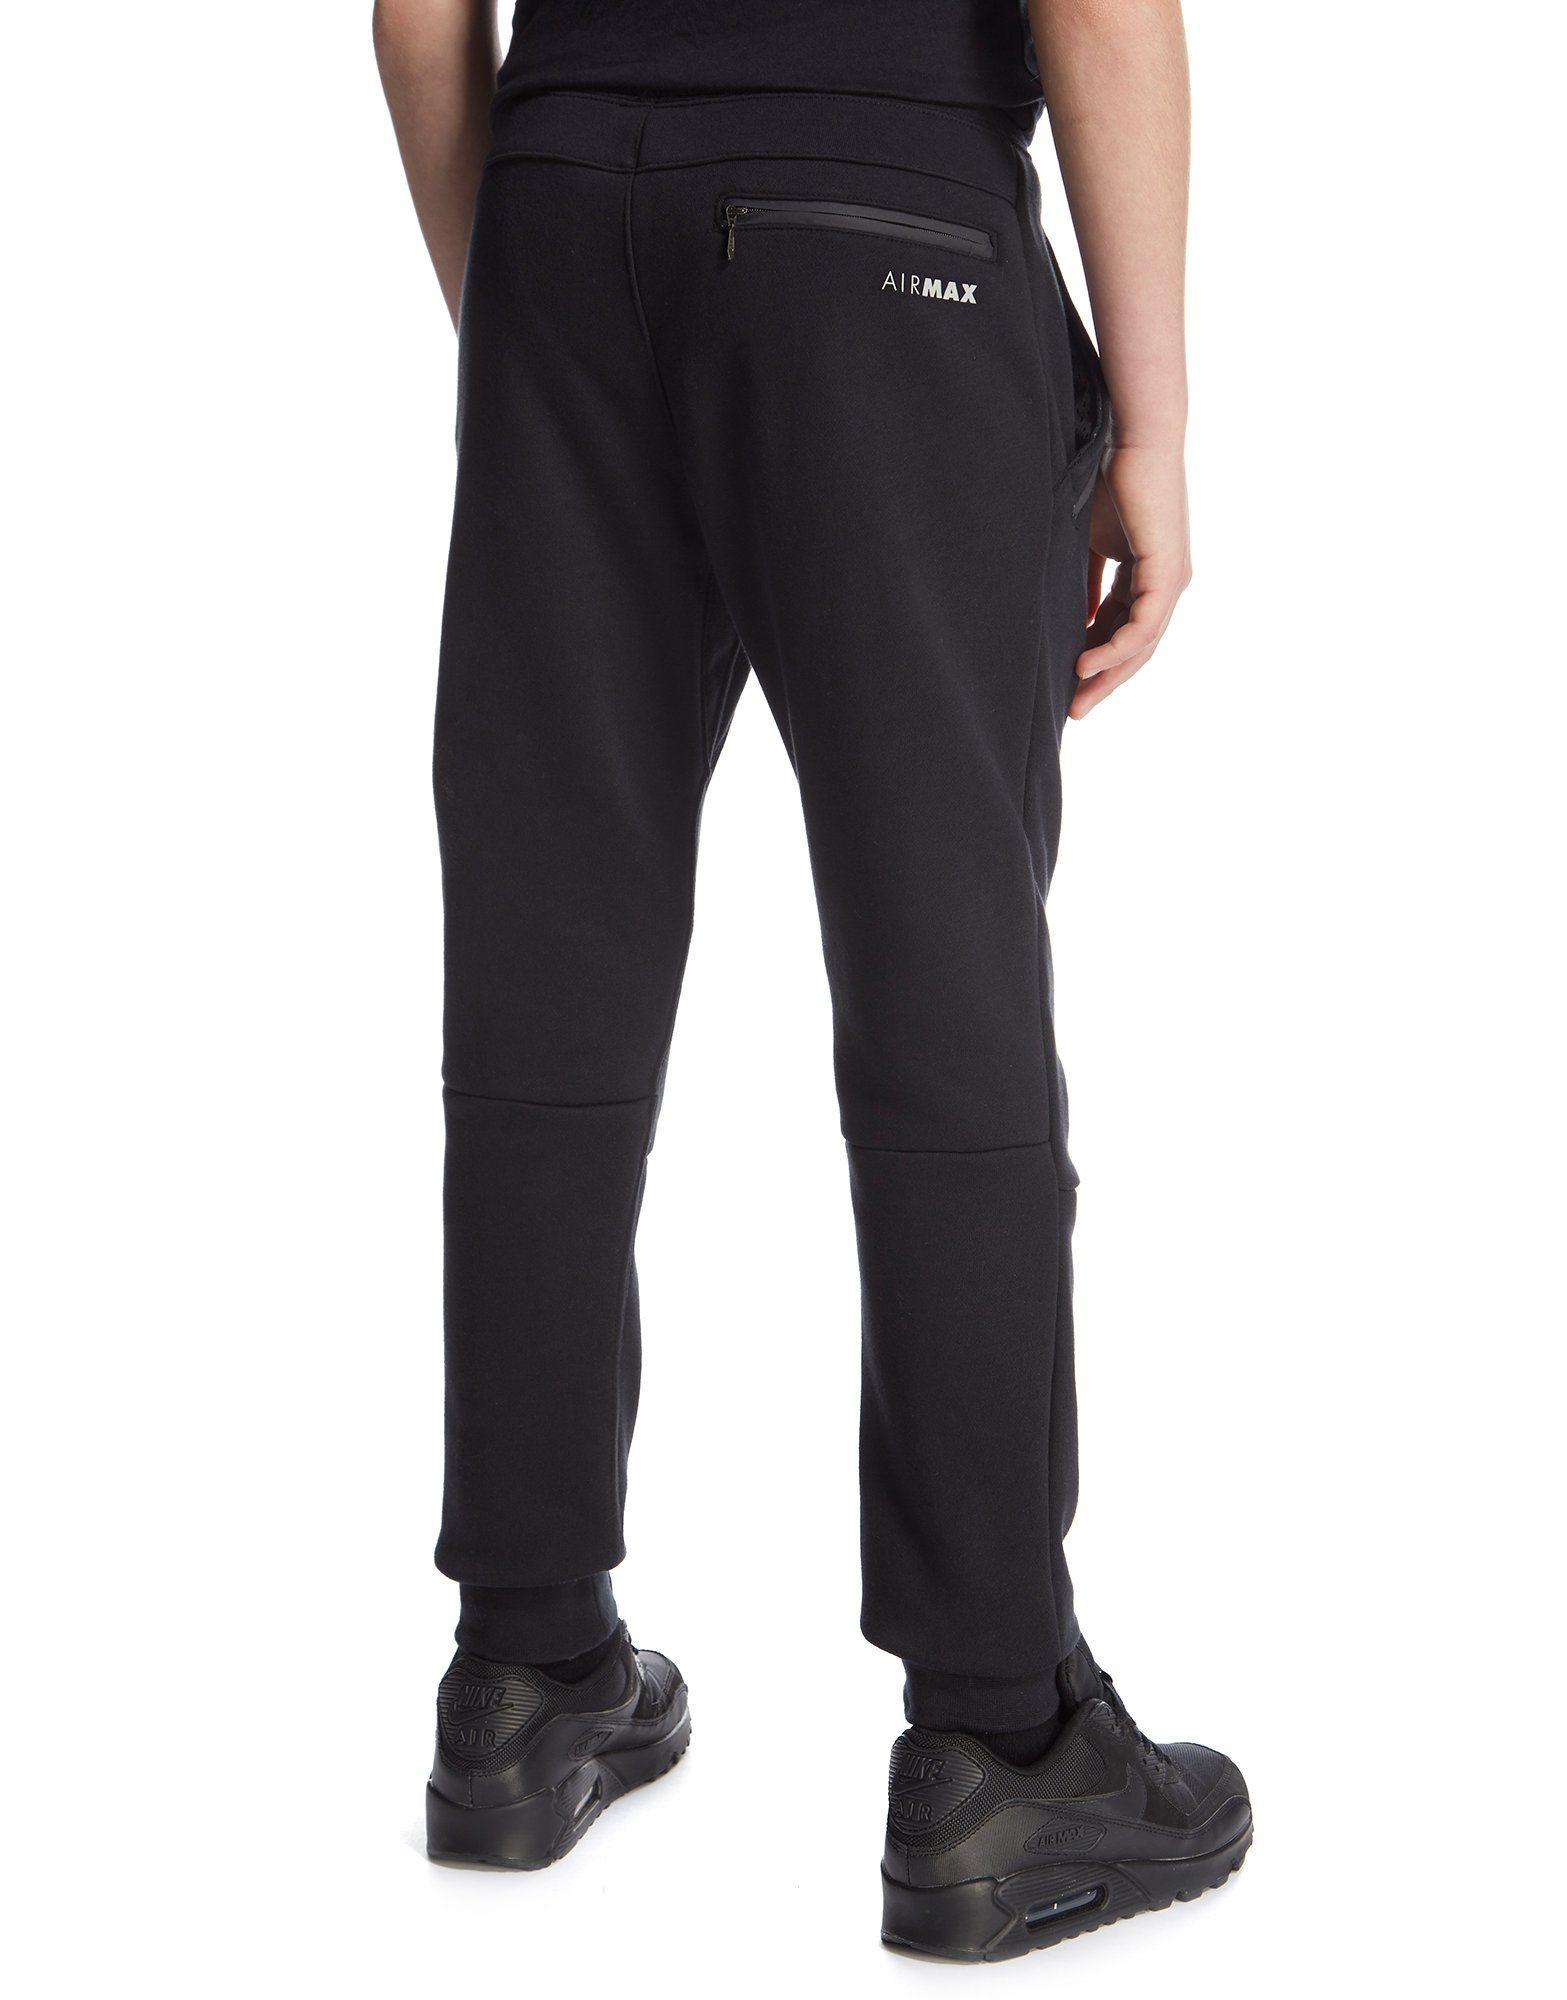 Brilliant Nike Sweatshirt Jogger Pants Nike Air Max | Teen Boys Swagg | Pinterest | Nike Sweatshirts ...